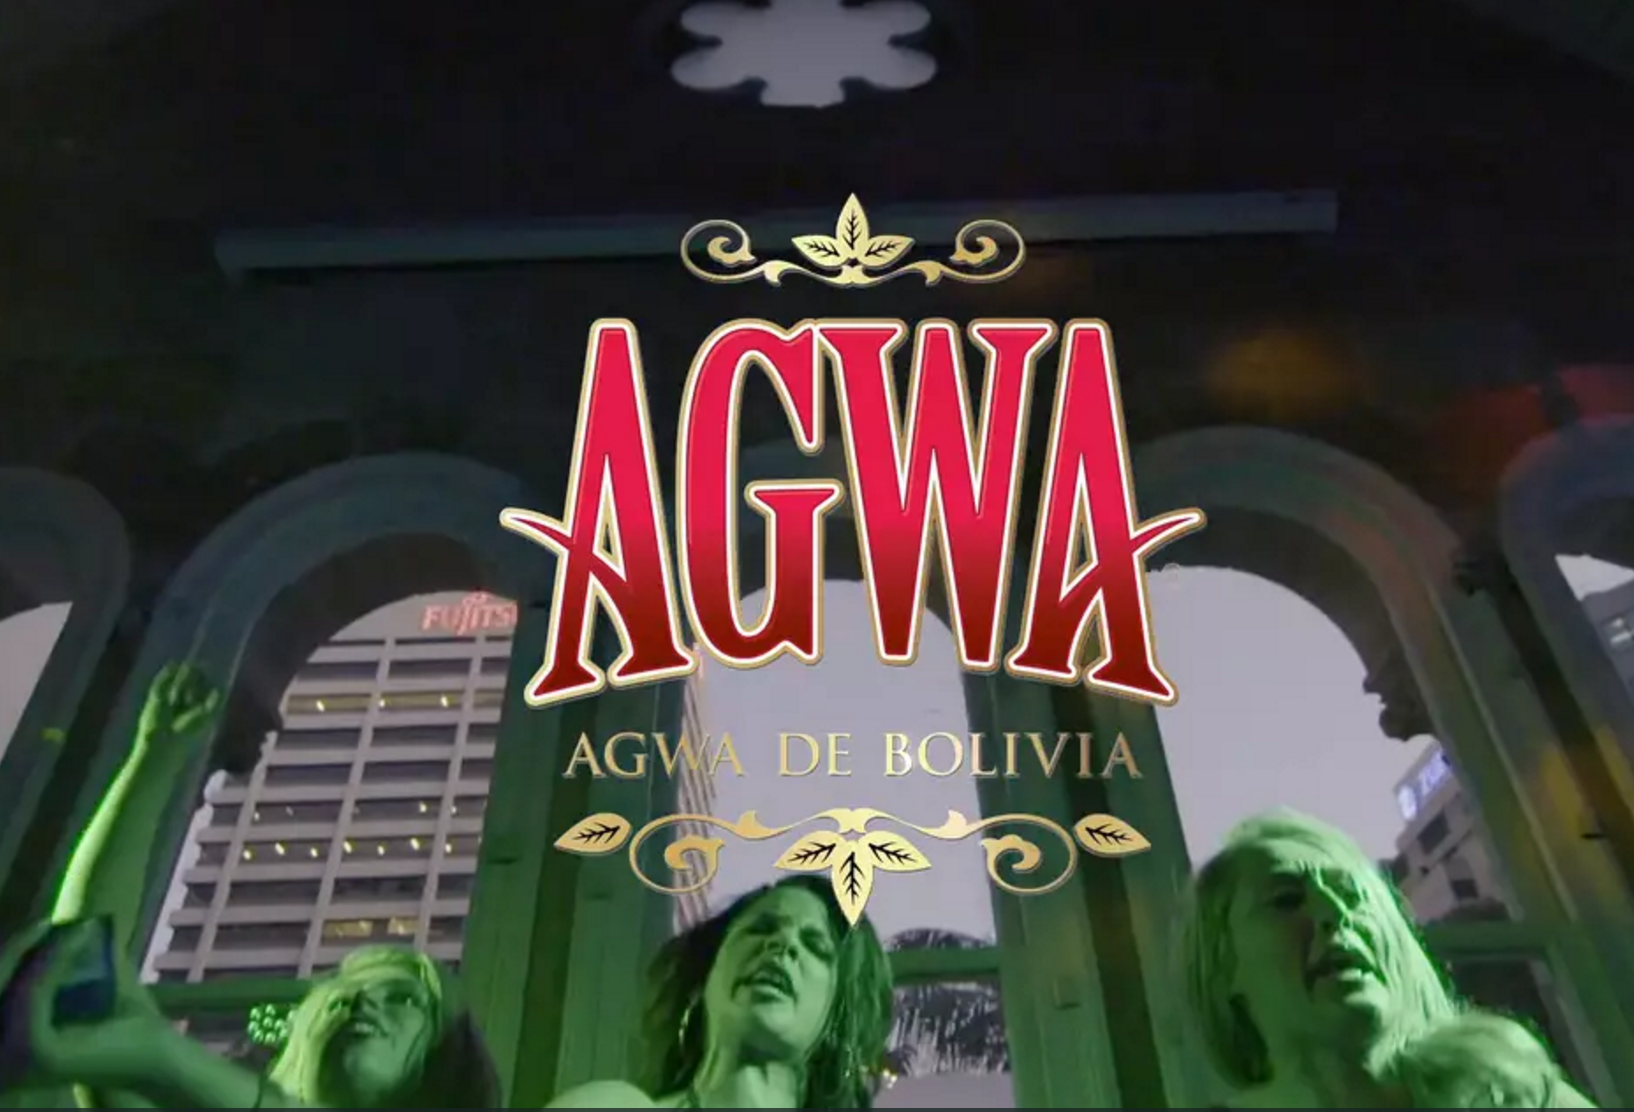 AGWA @ YOUR SHOT 2015 (FINAL)